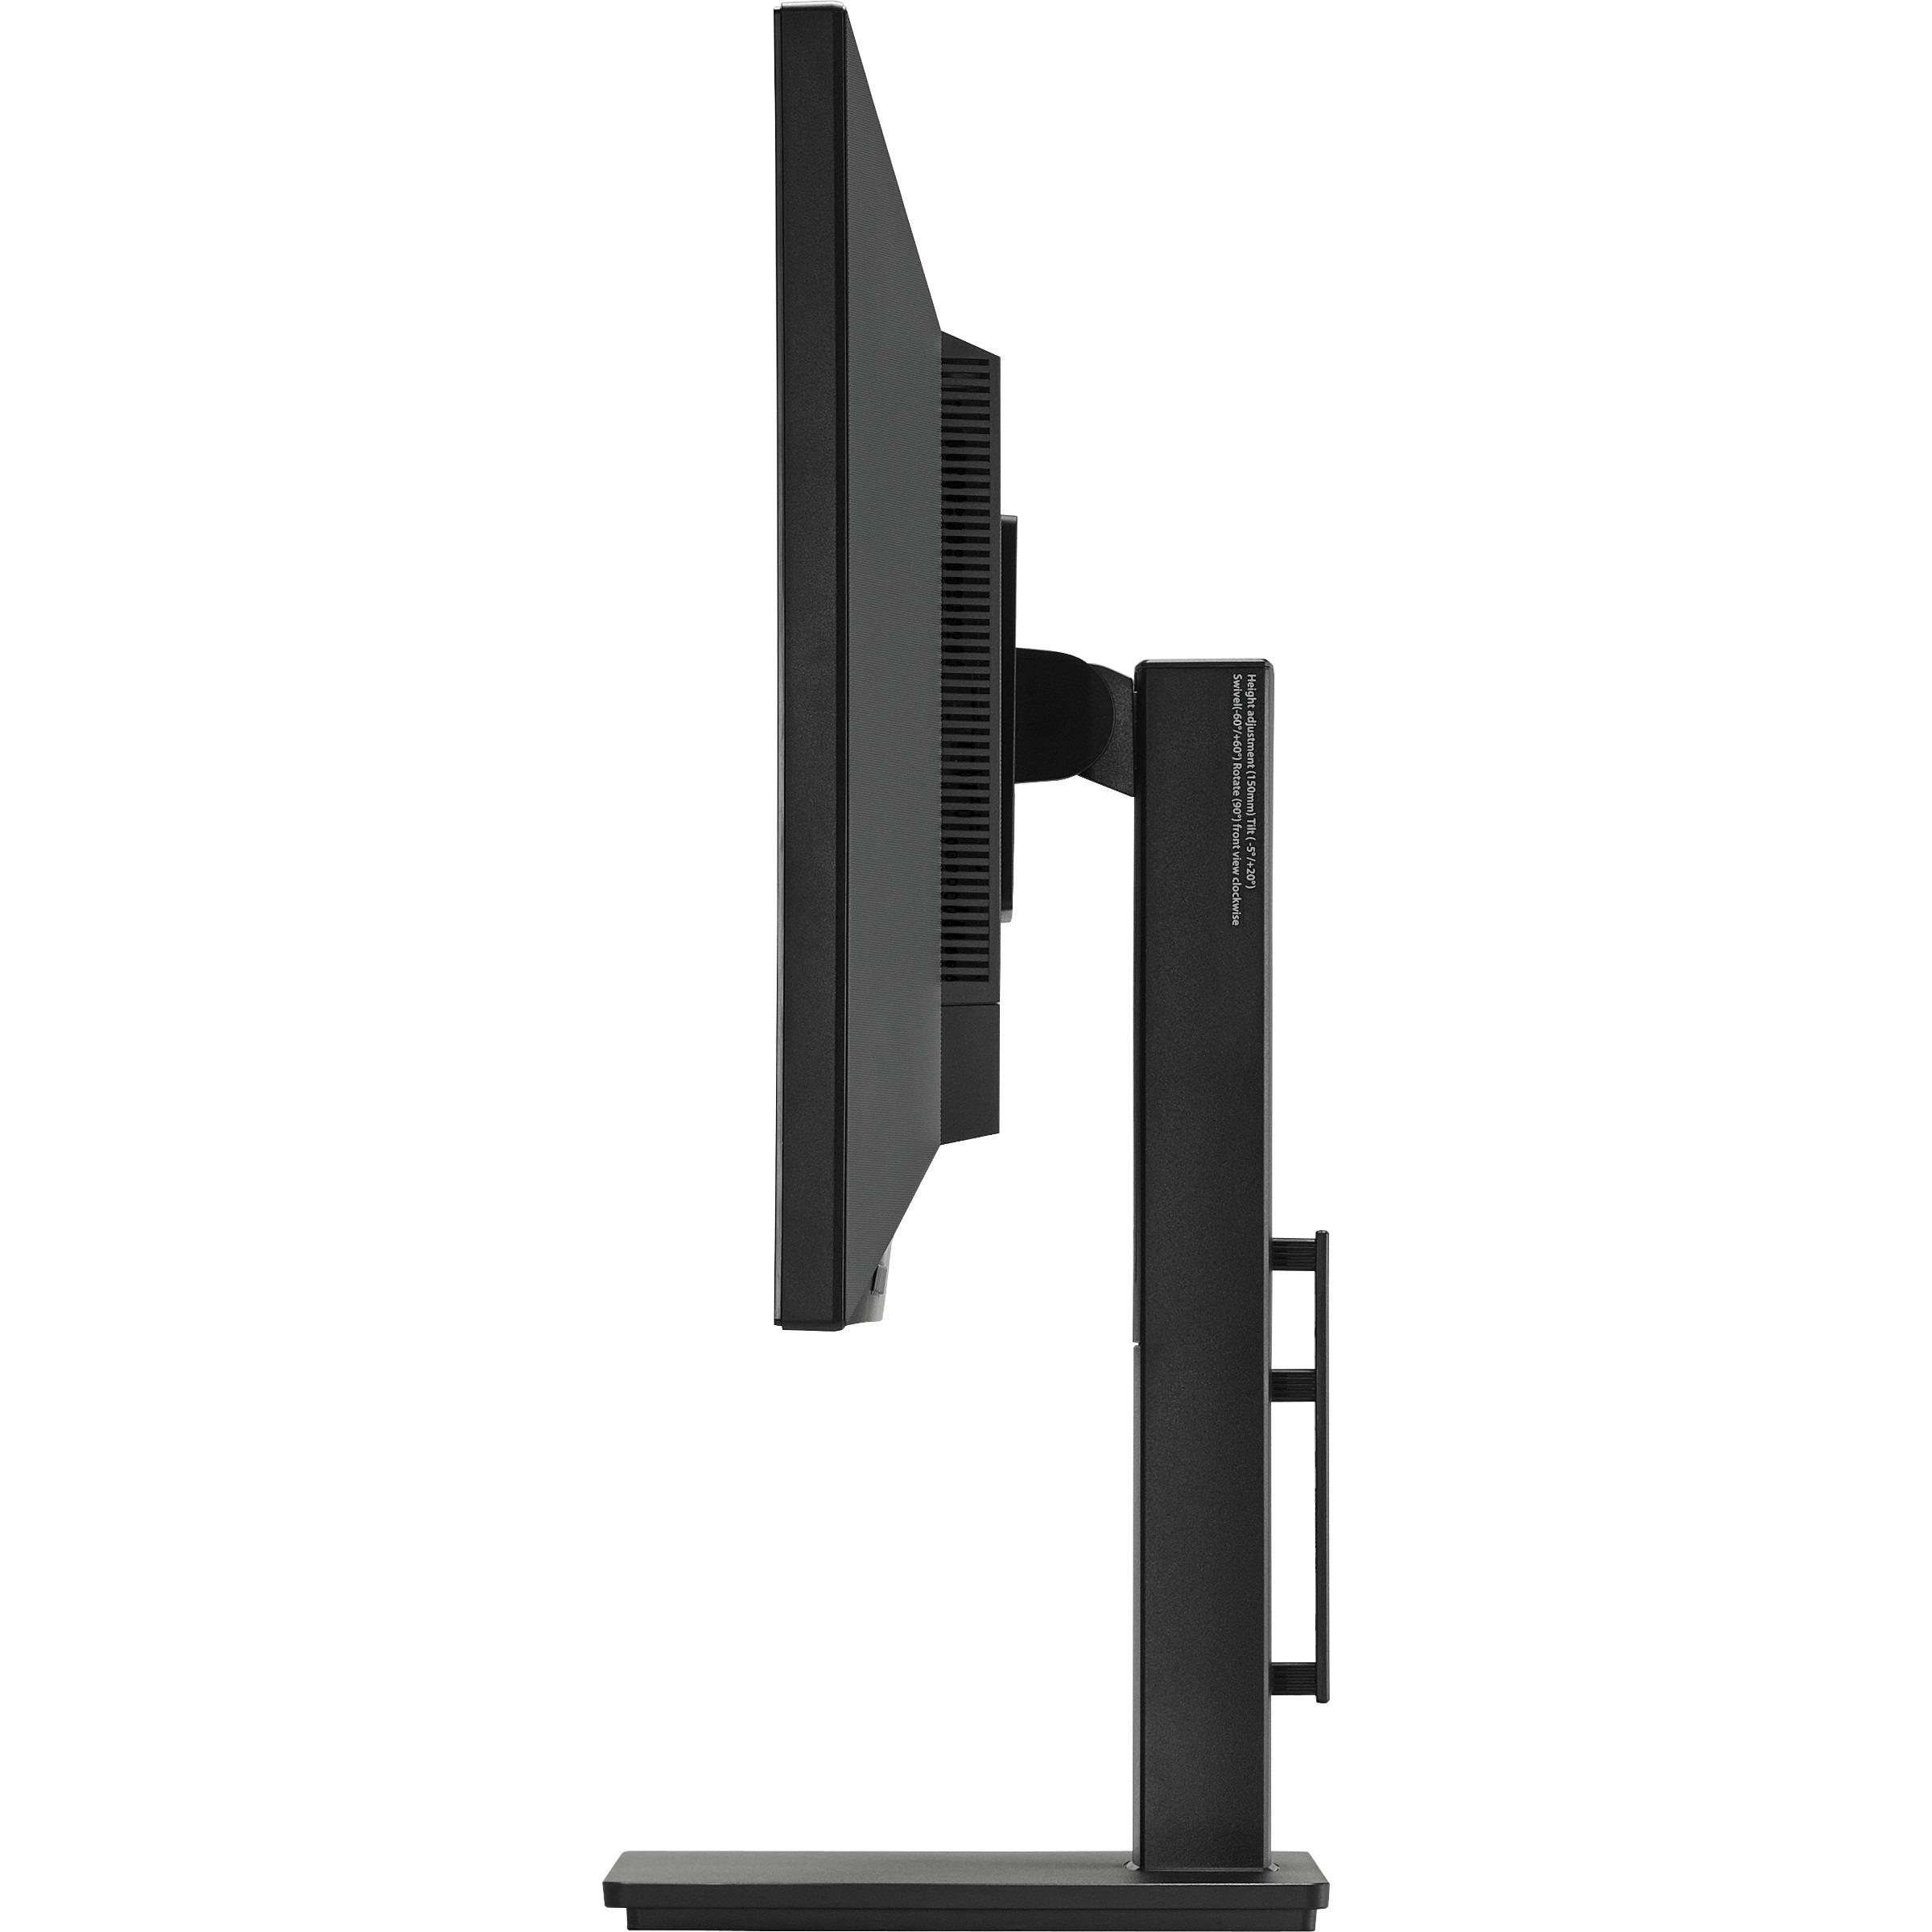 Asus PB287Q 71.1 cm 28inch LED LCD Monitor - 16:9 - 1 ms